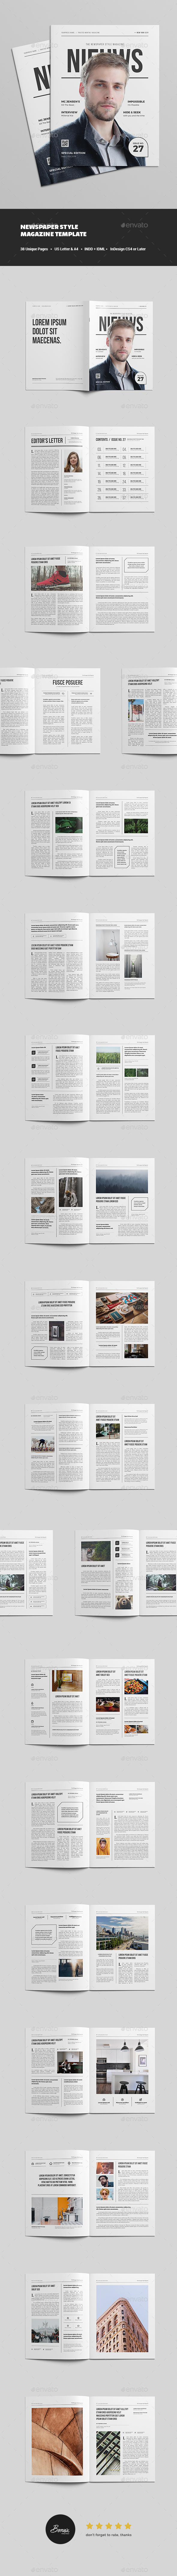 Newspaper Style Magazine - Magazines Print Templates